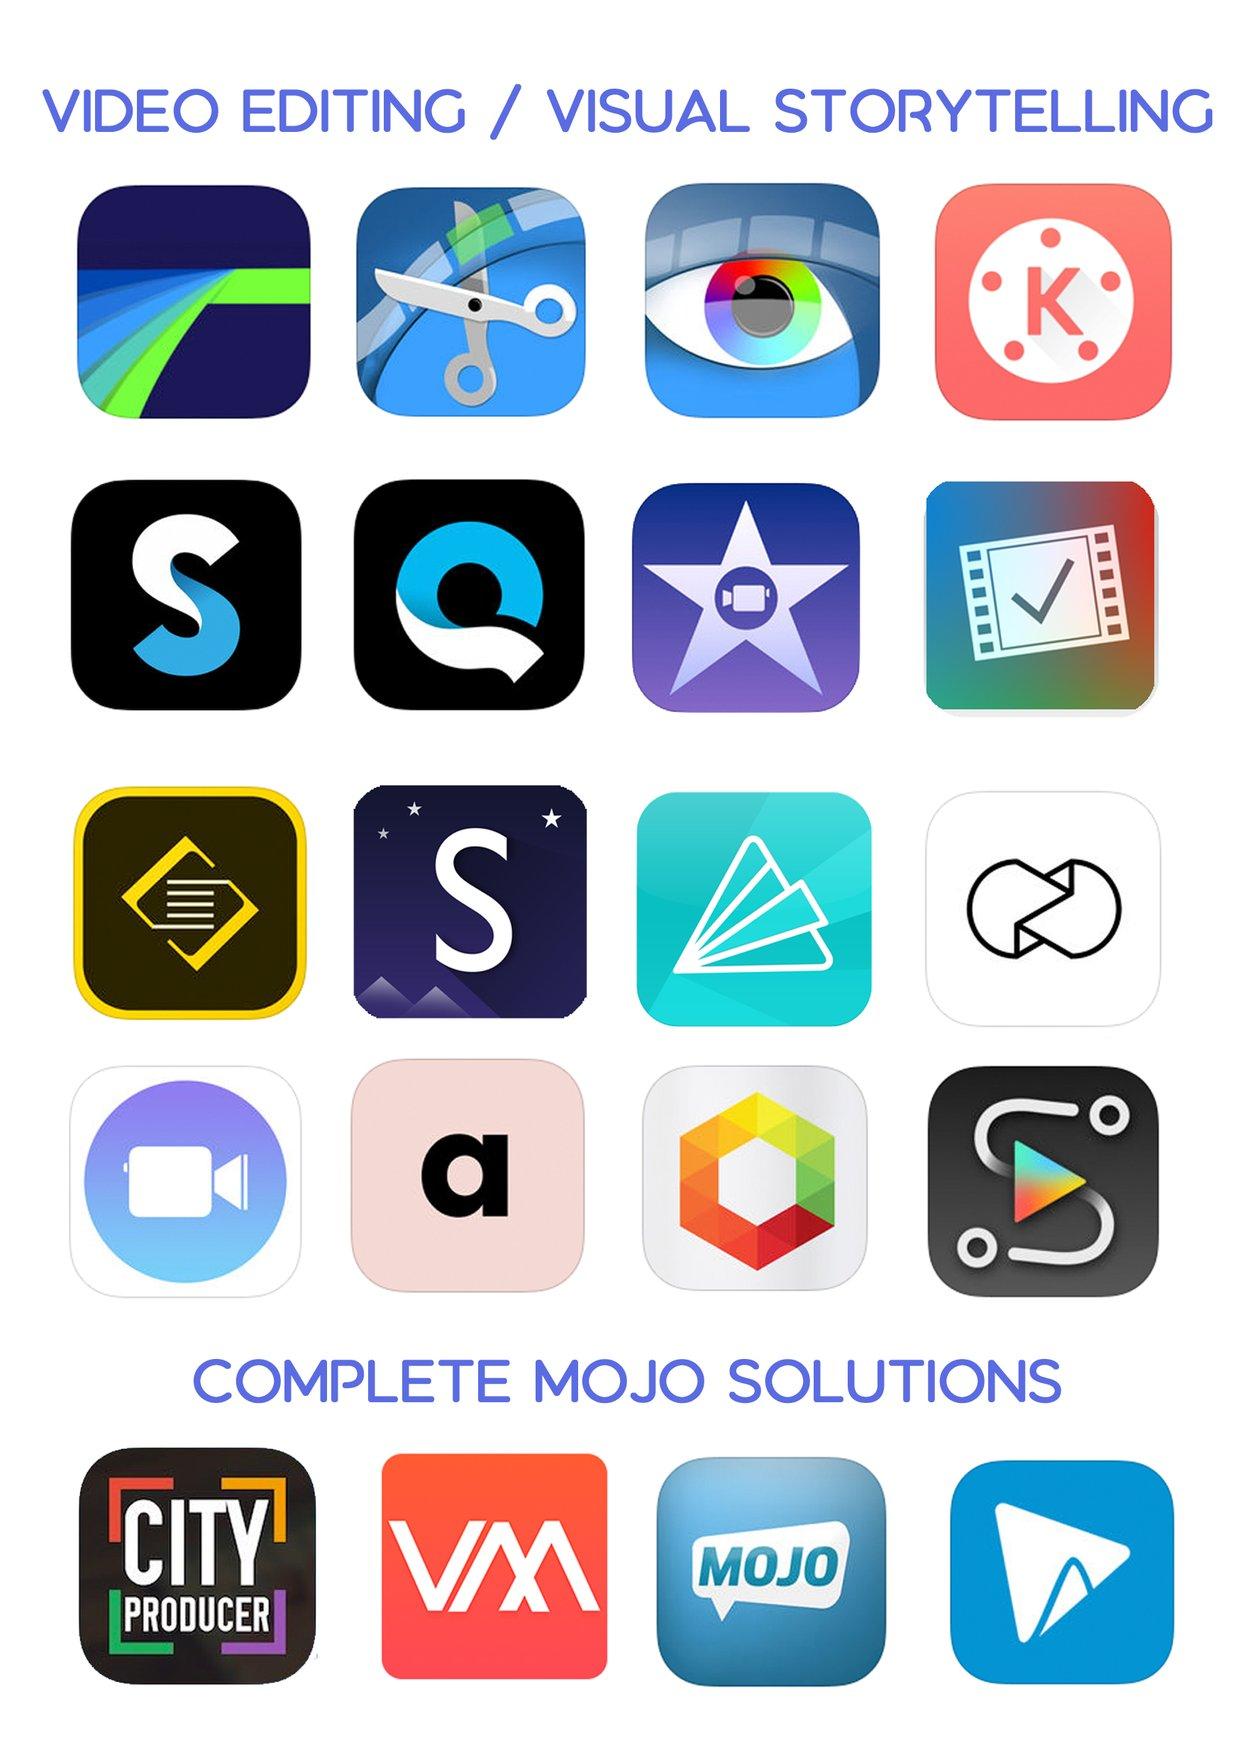 Ultimate iOS App List - Video Editing / Visual Stories